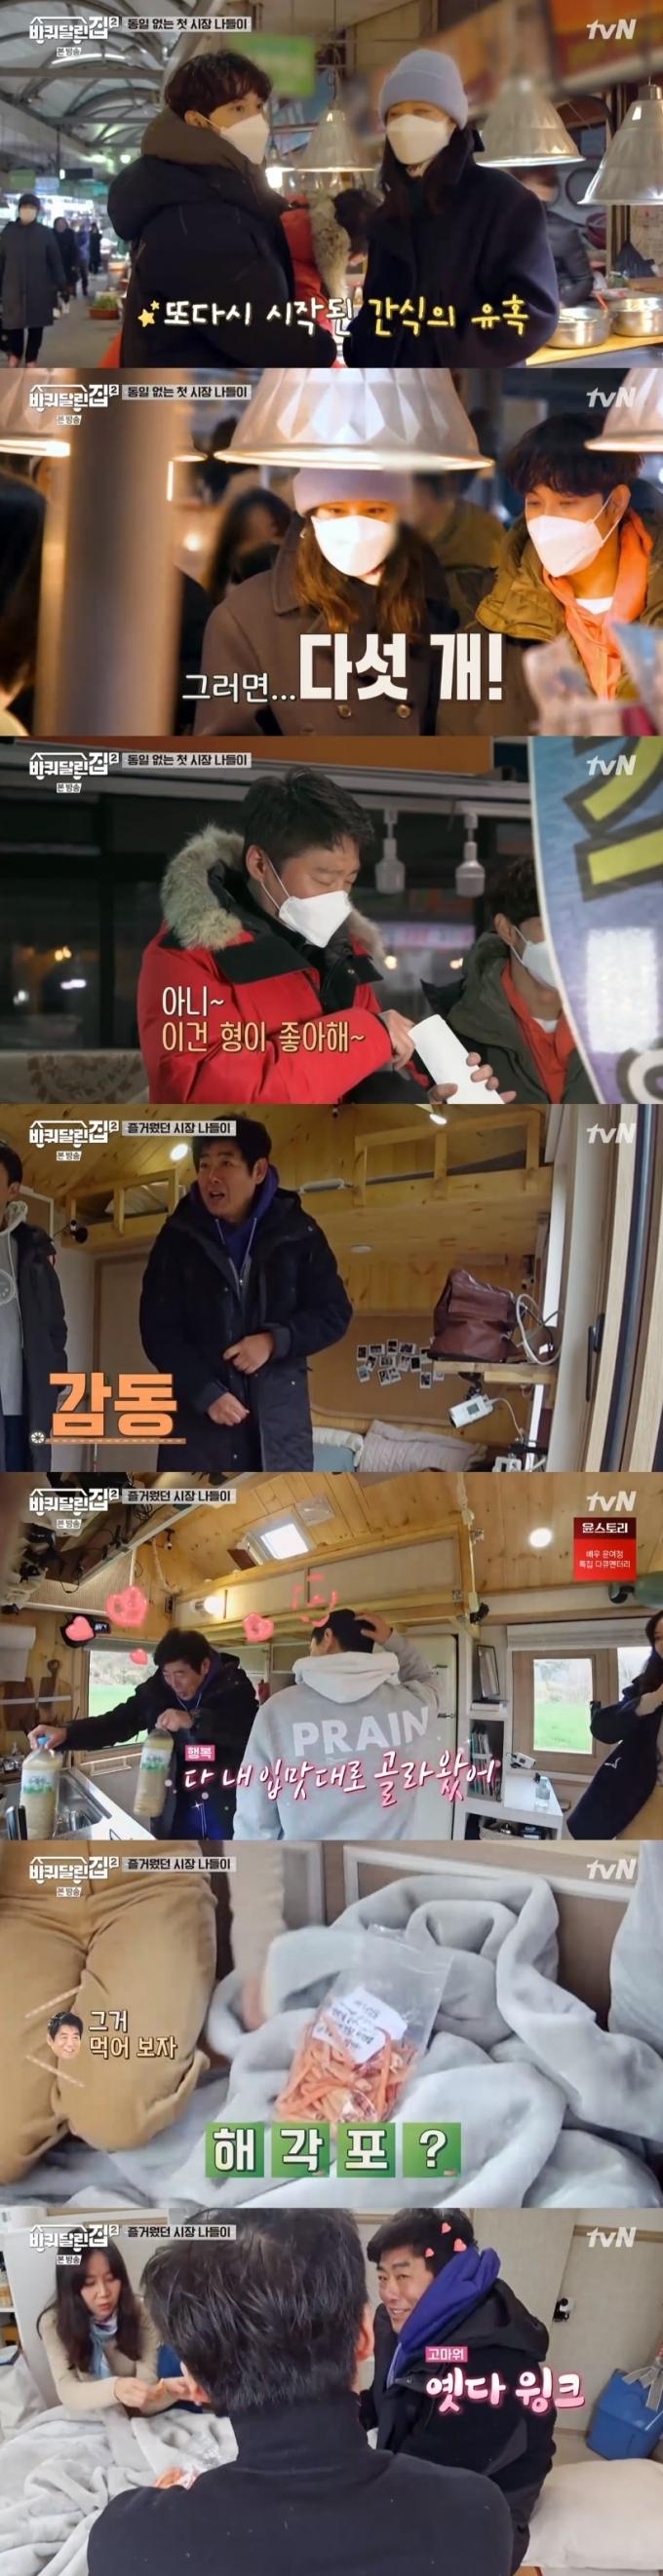 tvN '바퀴 달린 집2' 캡처 © 뉴스1